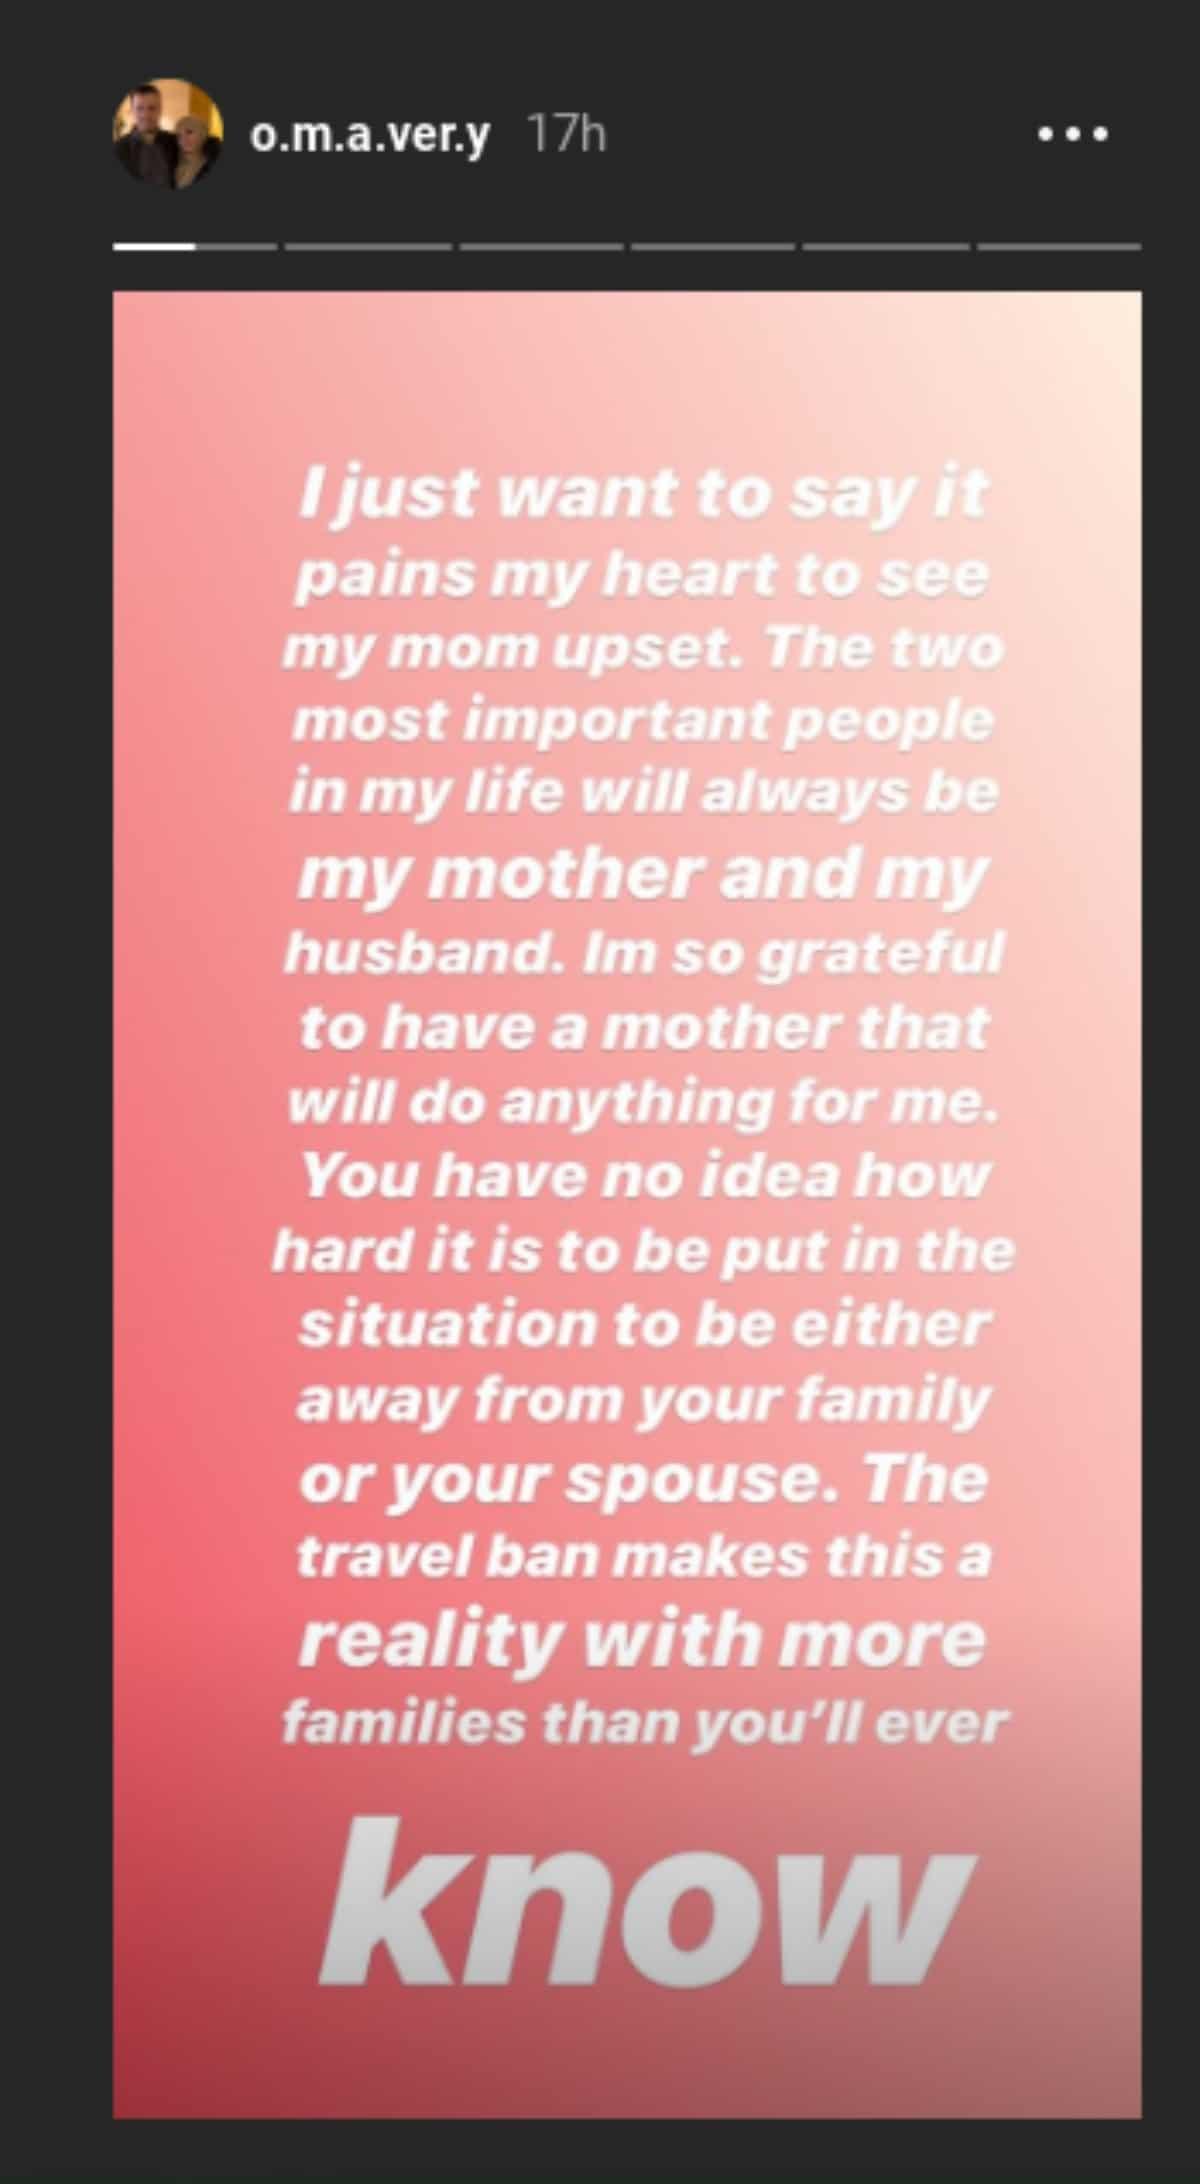 Avery Mills' Instagram story